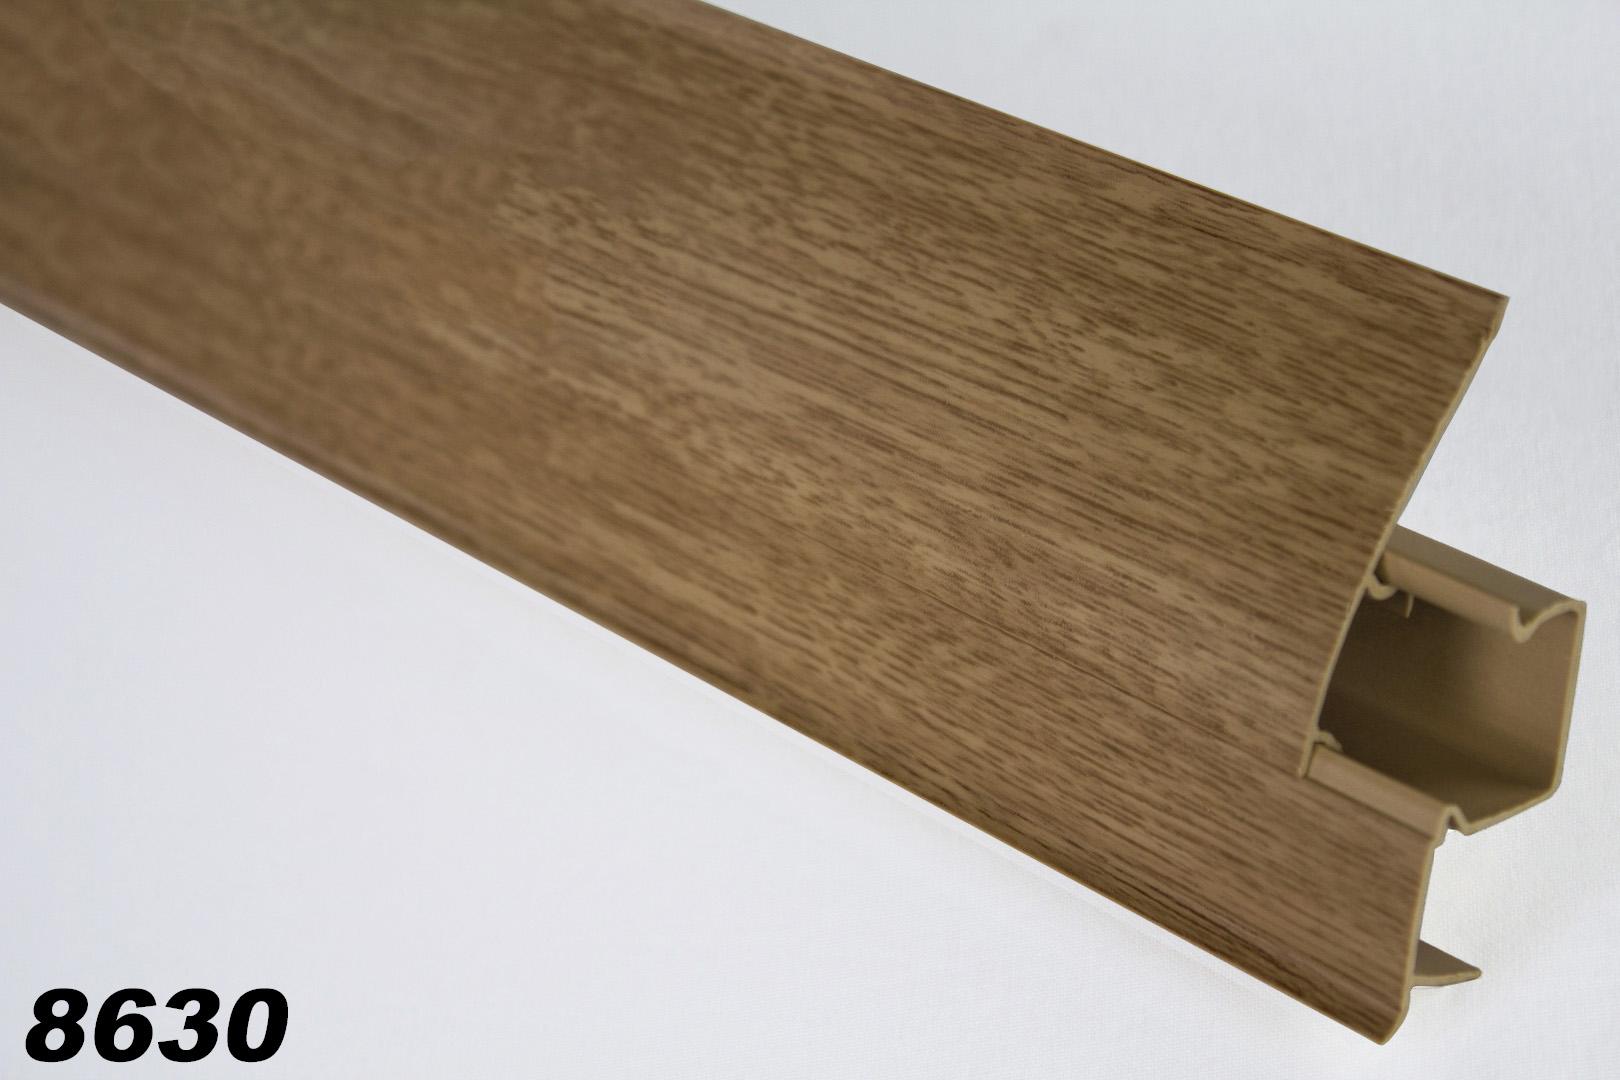 paket] 10 meter pvc sockelleisten modern, fußleisten, kabelkanal